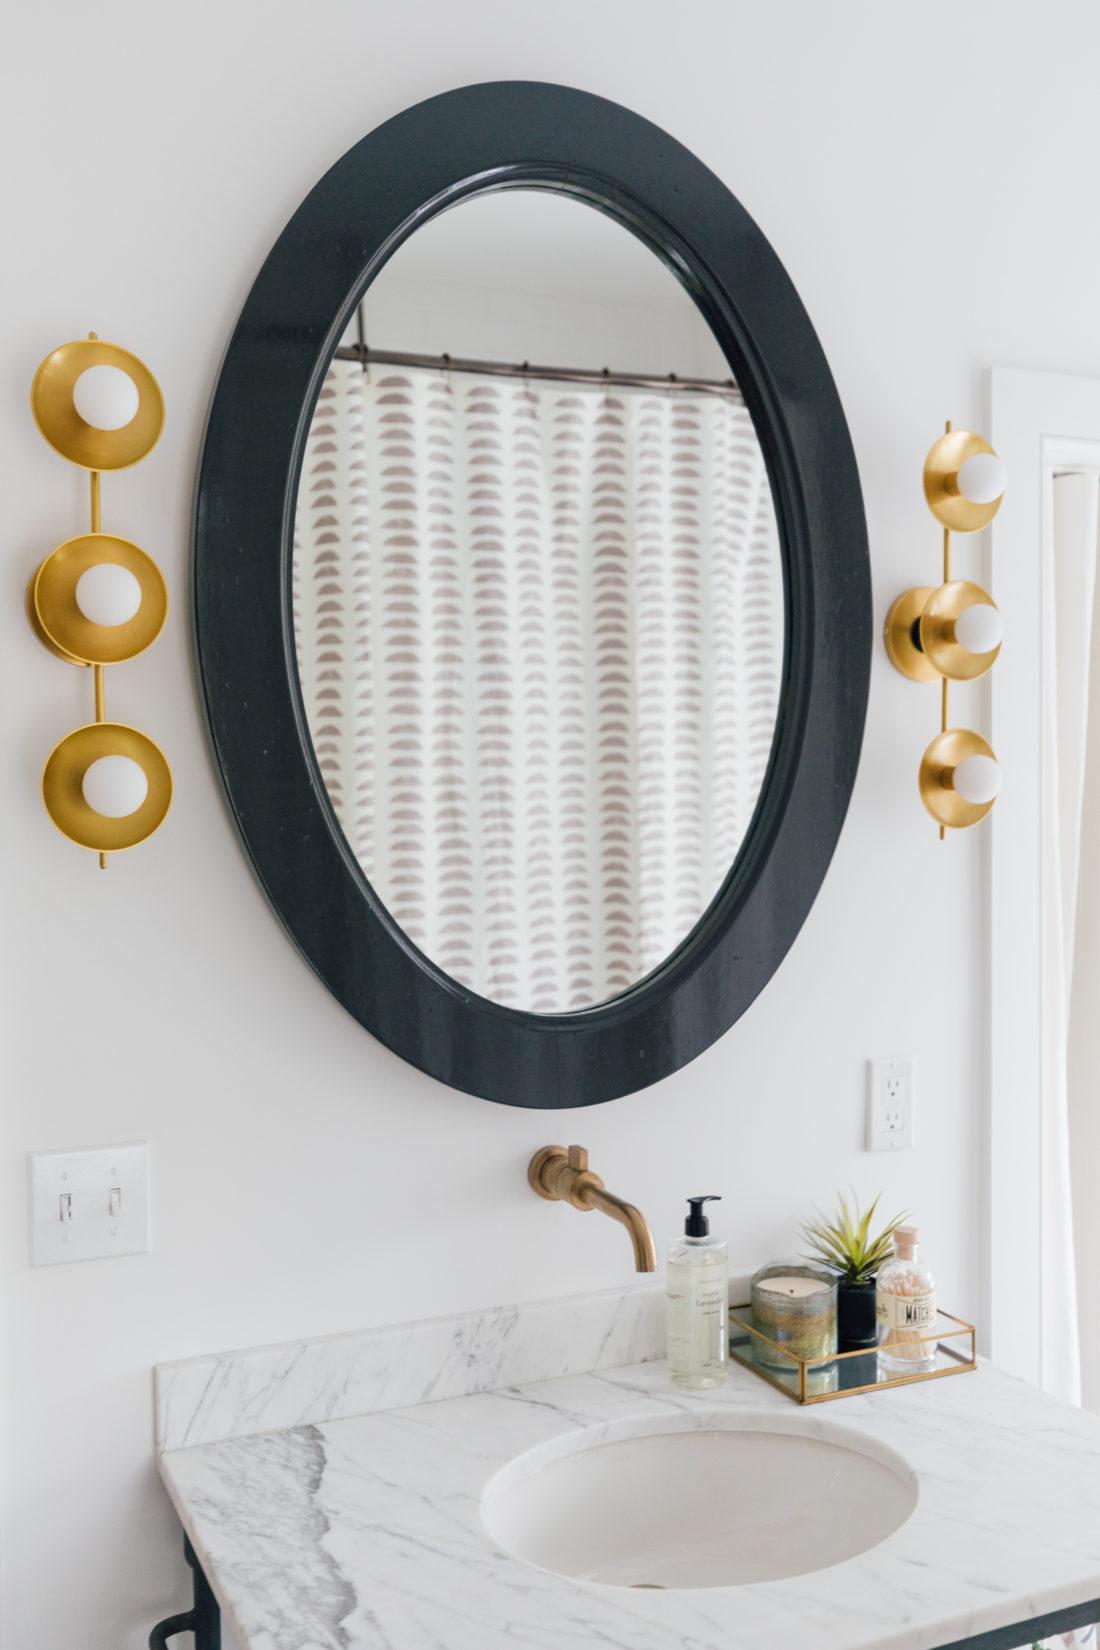 Bathroom fixtures inside Eva Amurri's newly finished Guest Suite